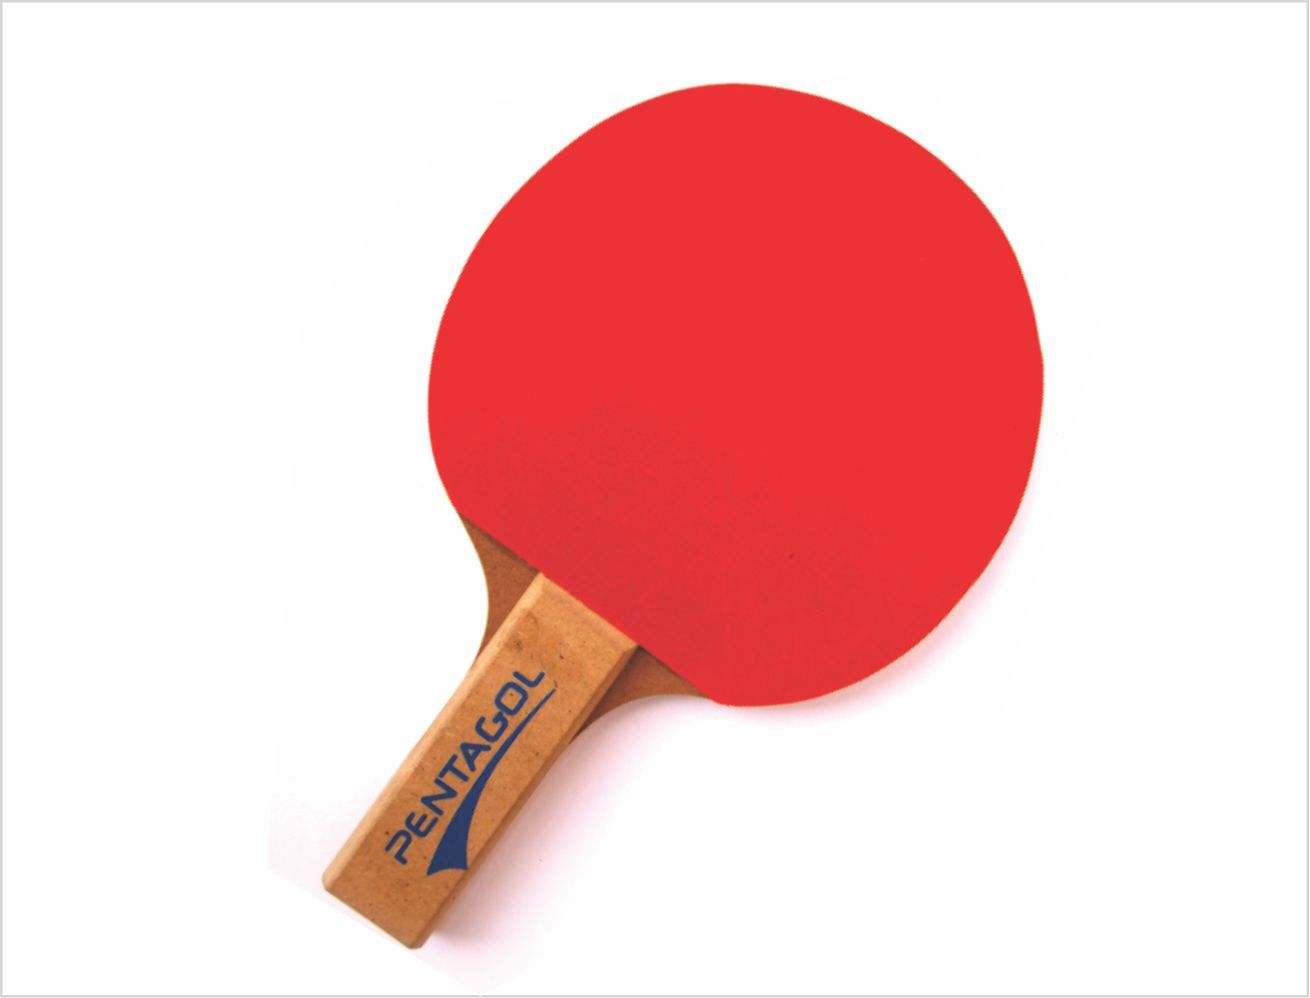 Raquete Tenis de Mesa Ping Pong - EVA Standard - Pentagol  - Loja do Competidor